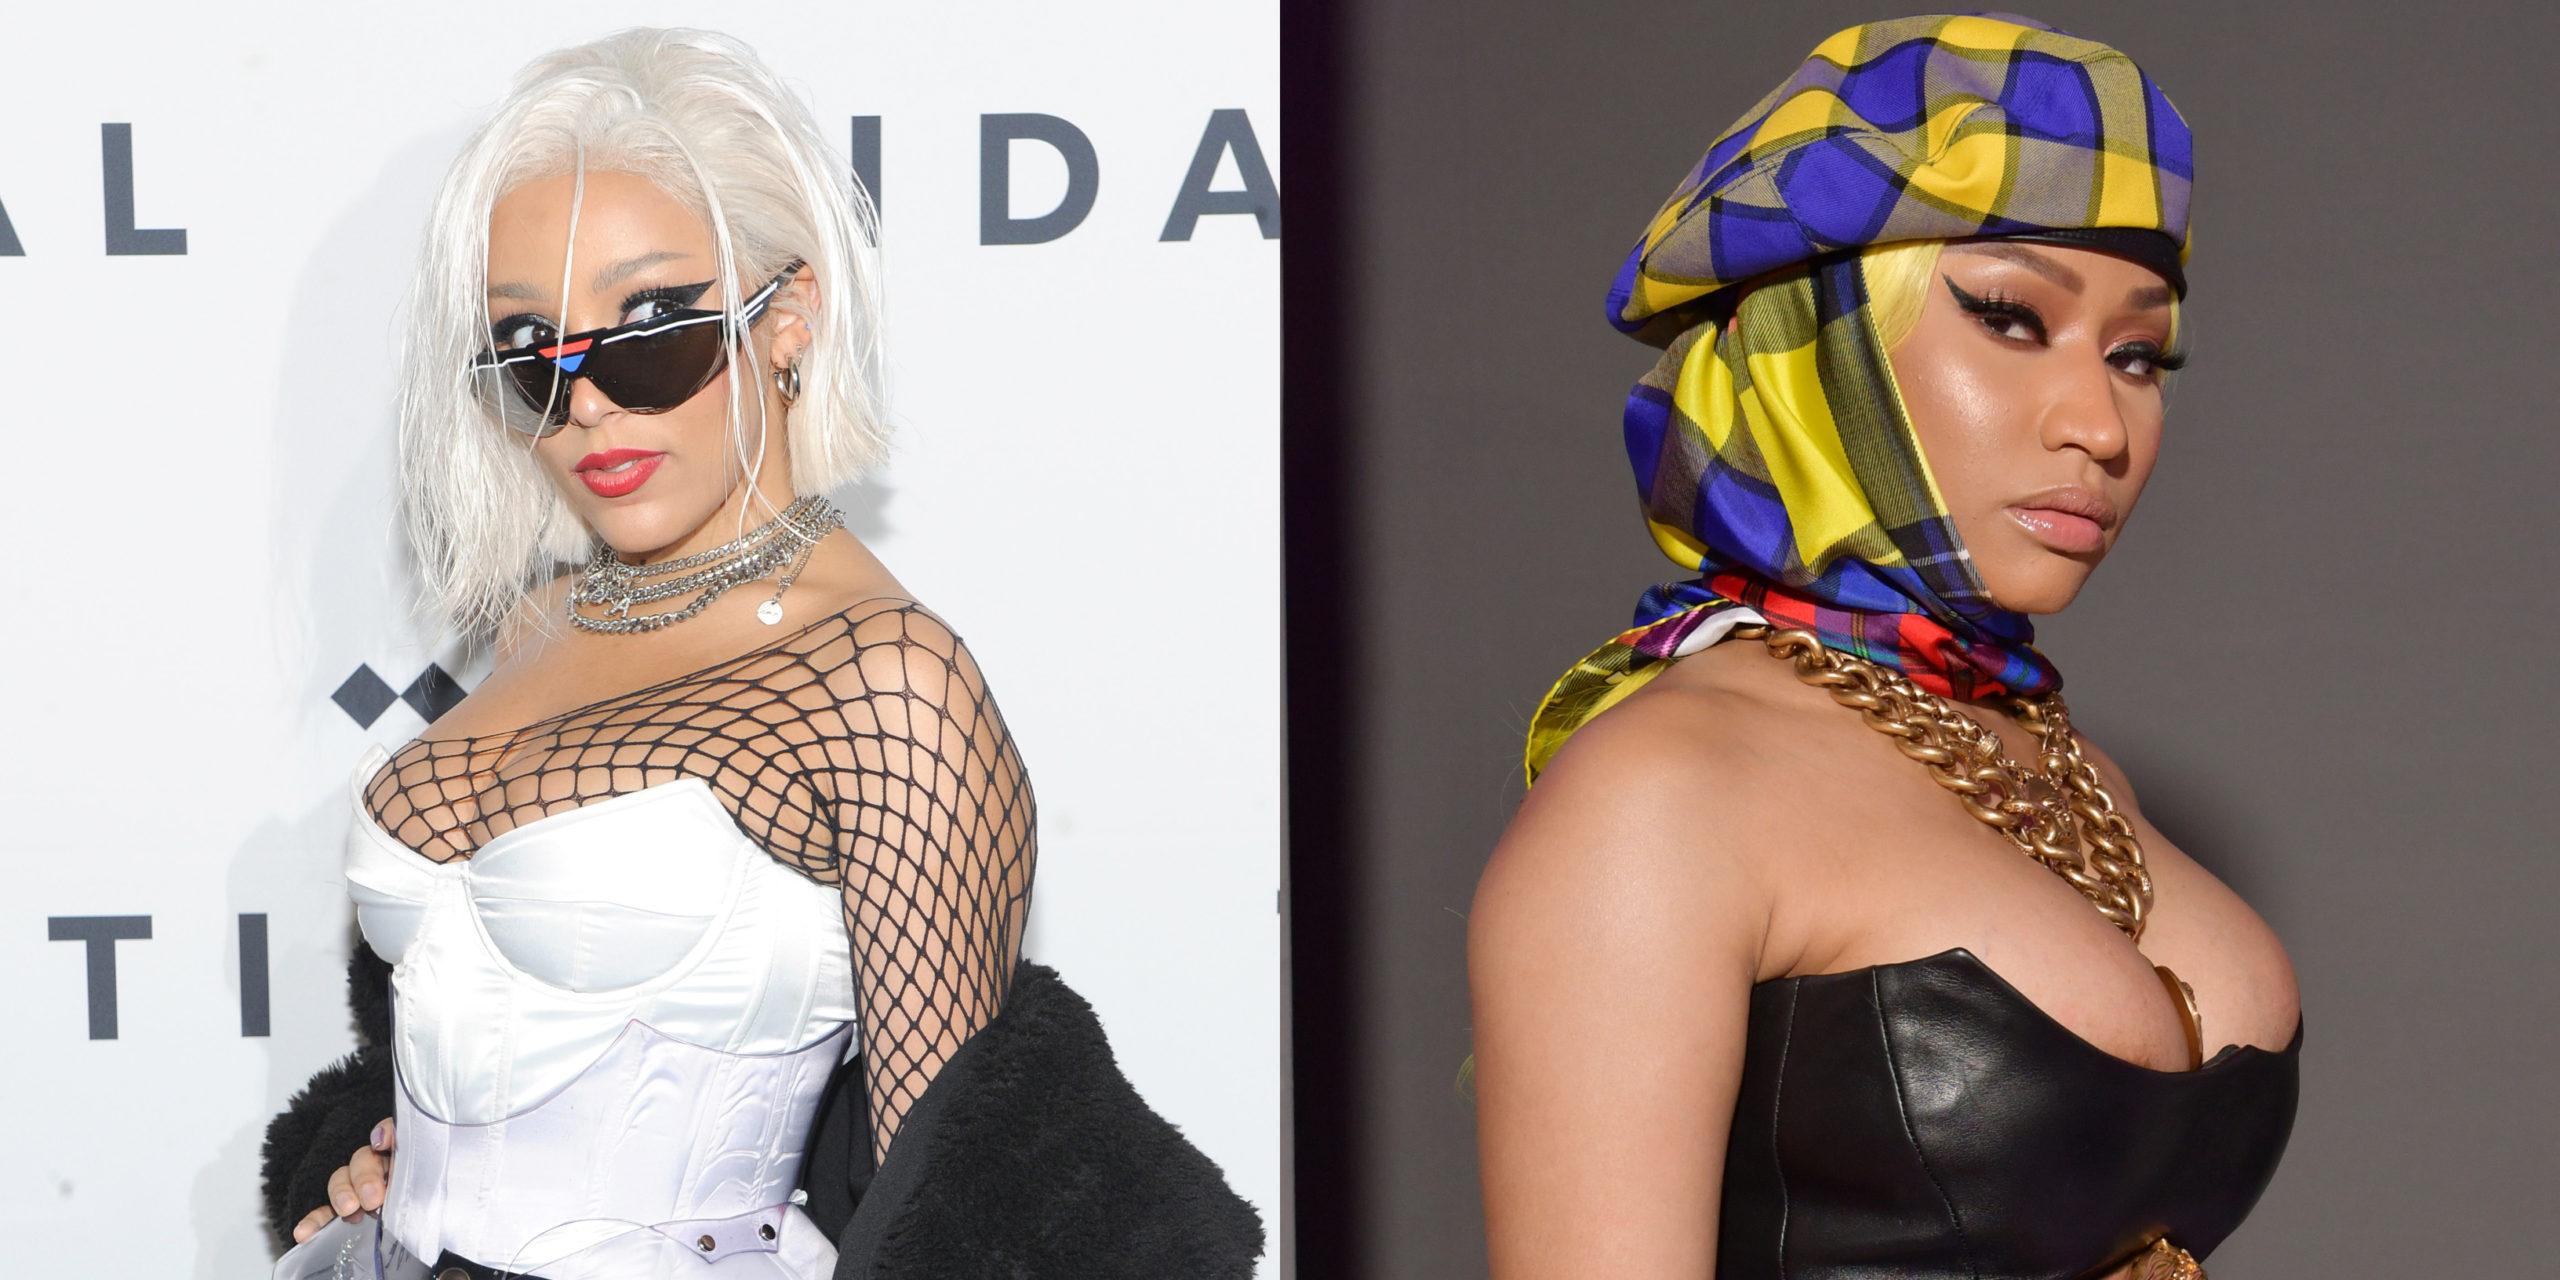 Here's Why Nicki Minaj is No Longer Listed on Doja Cat's 'Say So' on Billboard Hot 100